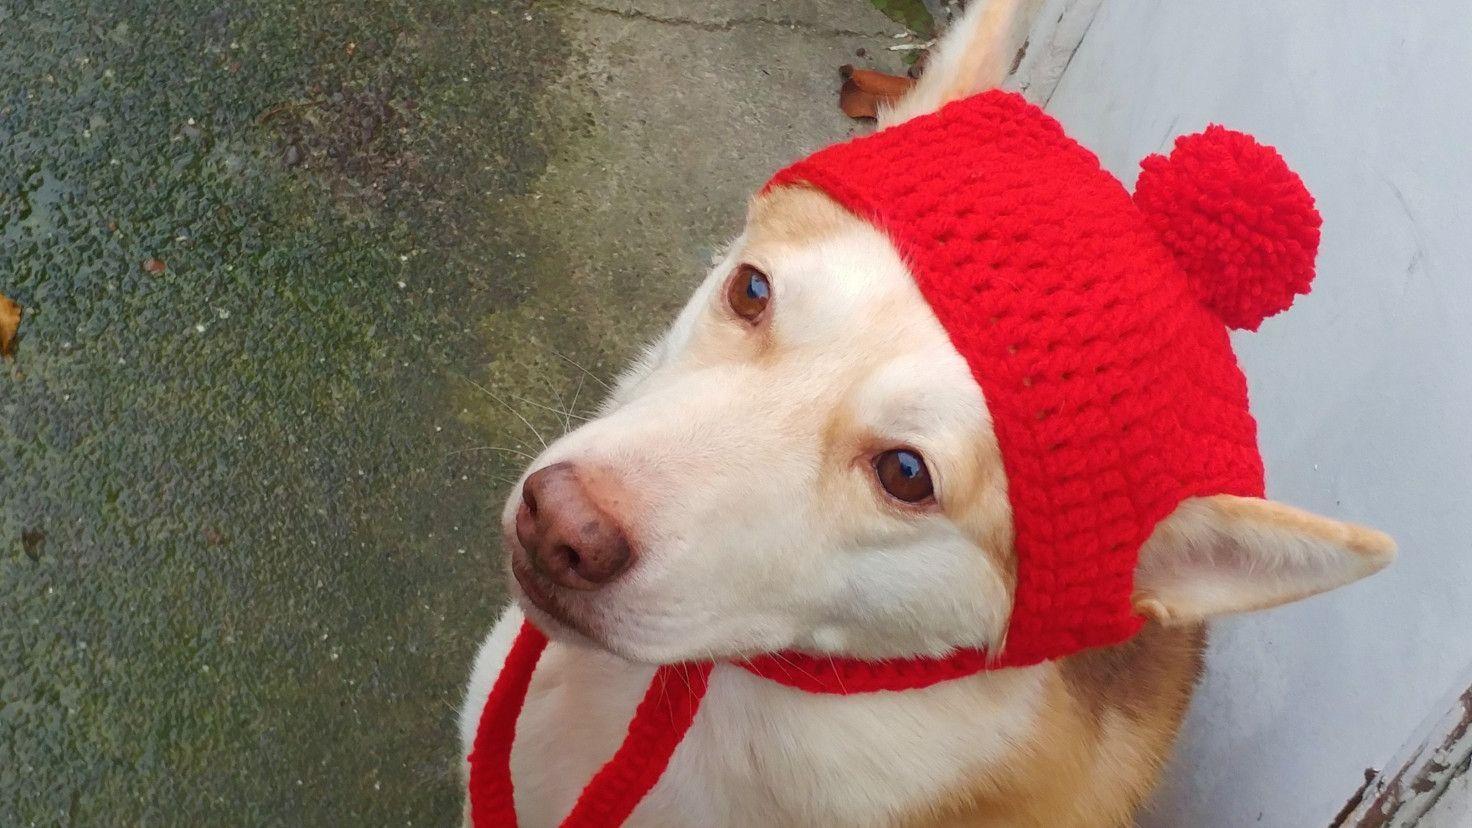 Large Xl Dog Crochet Beanie Pattern Dog Sweater Crochet Pattern Crochet Dog Crochet Dog Clothes